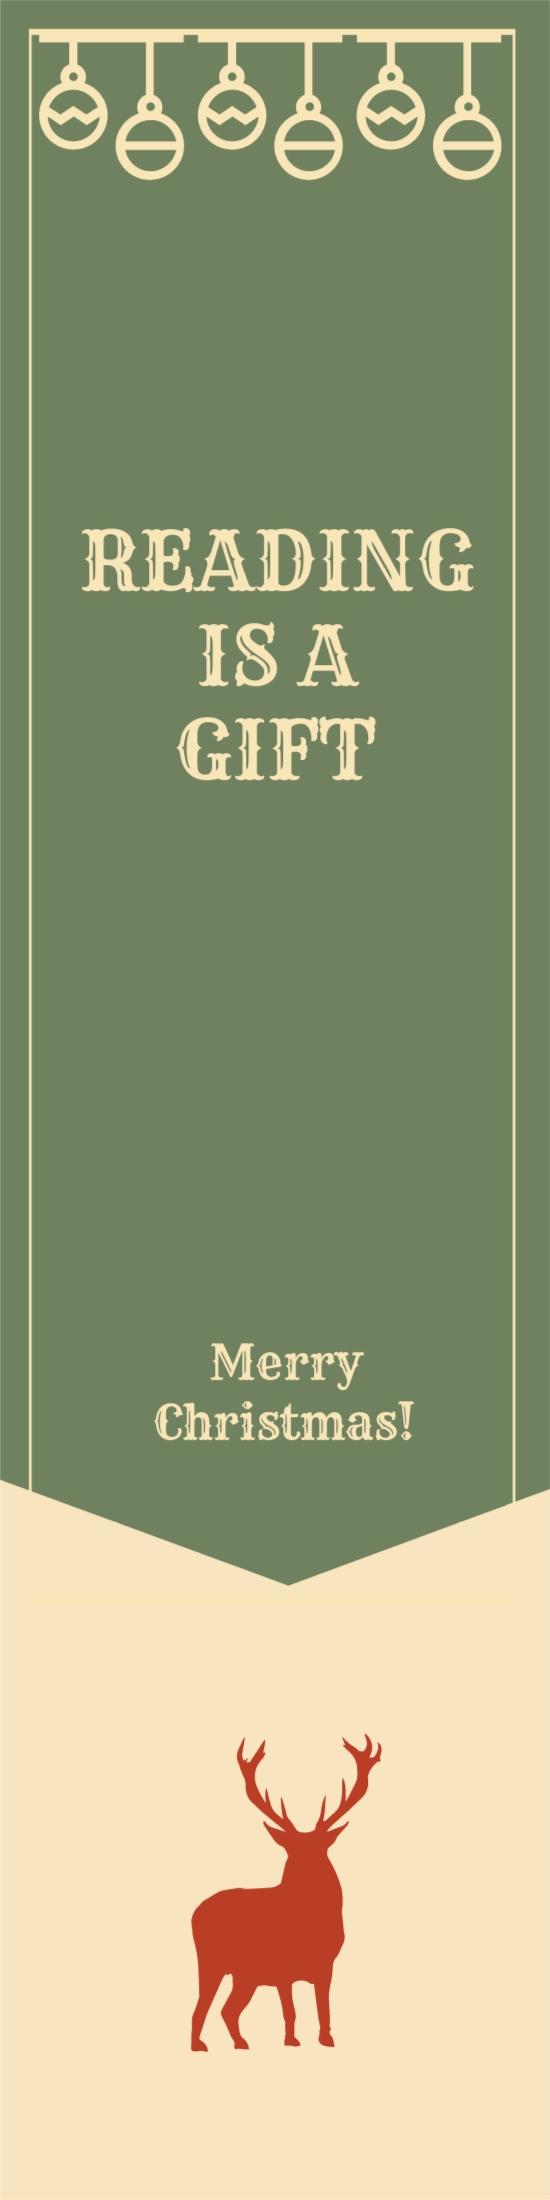 Vintage Christmas Bookmark Template